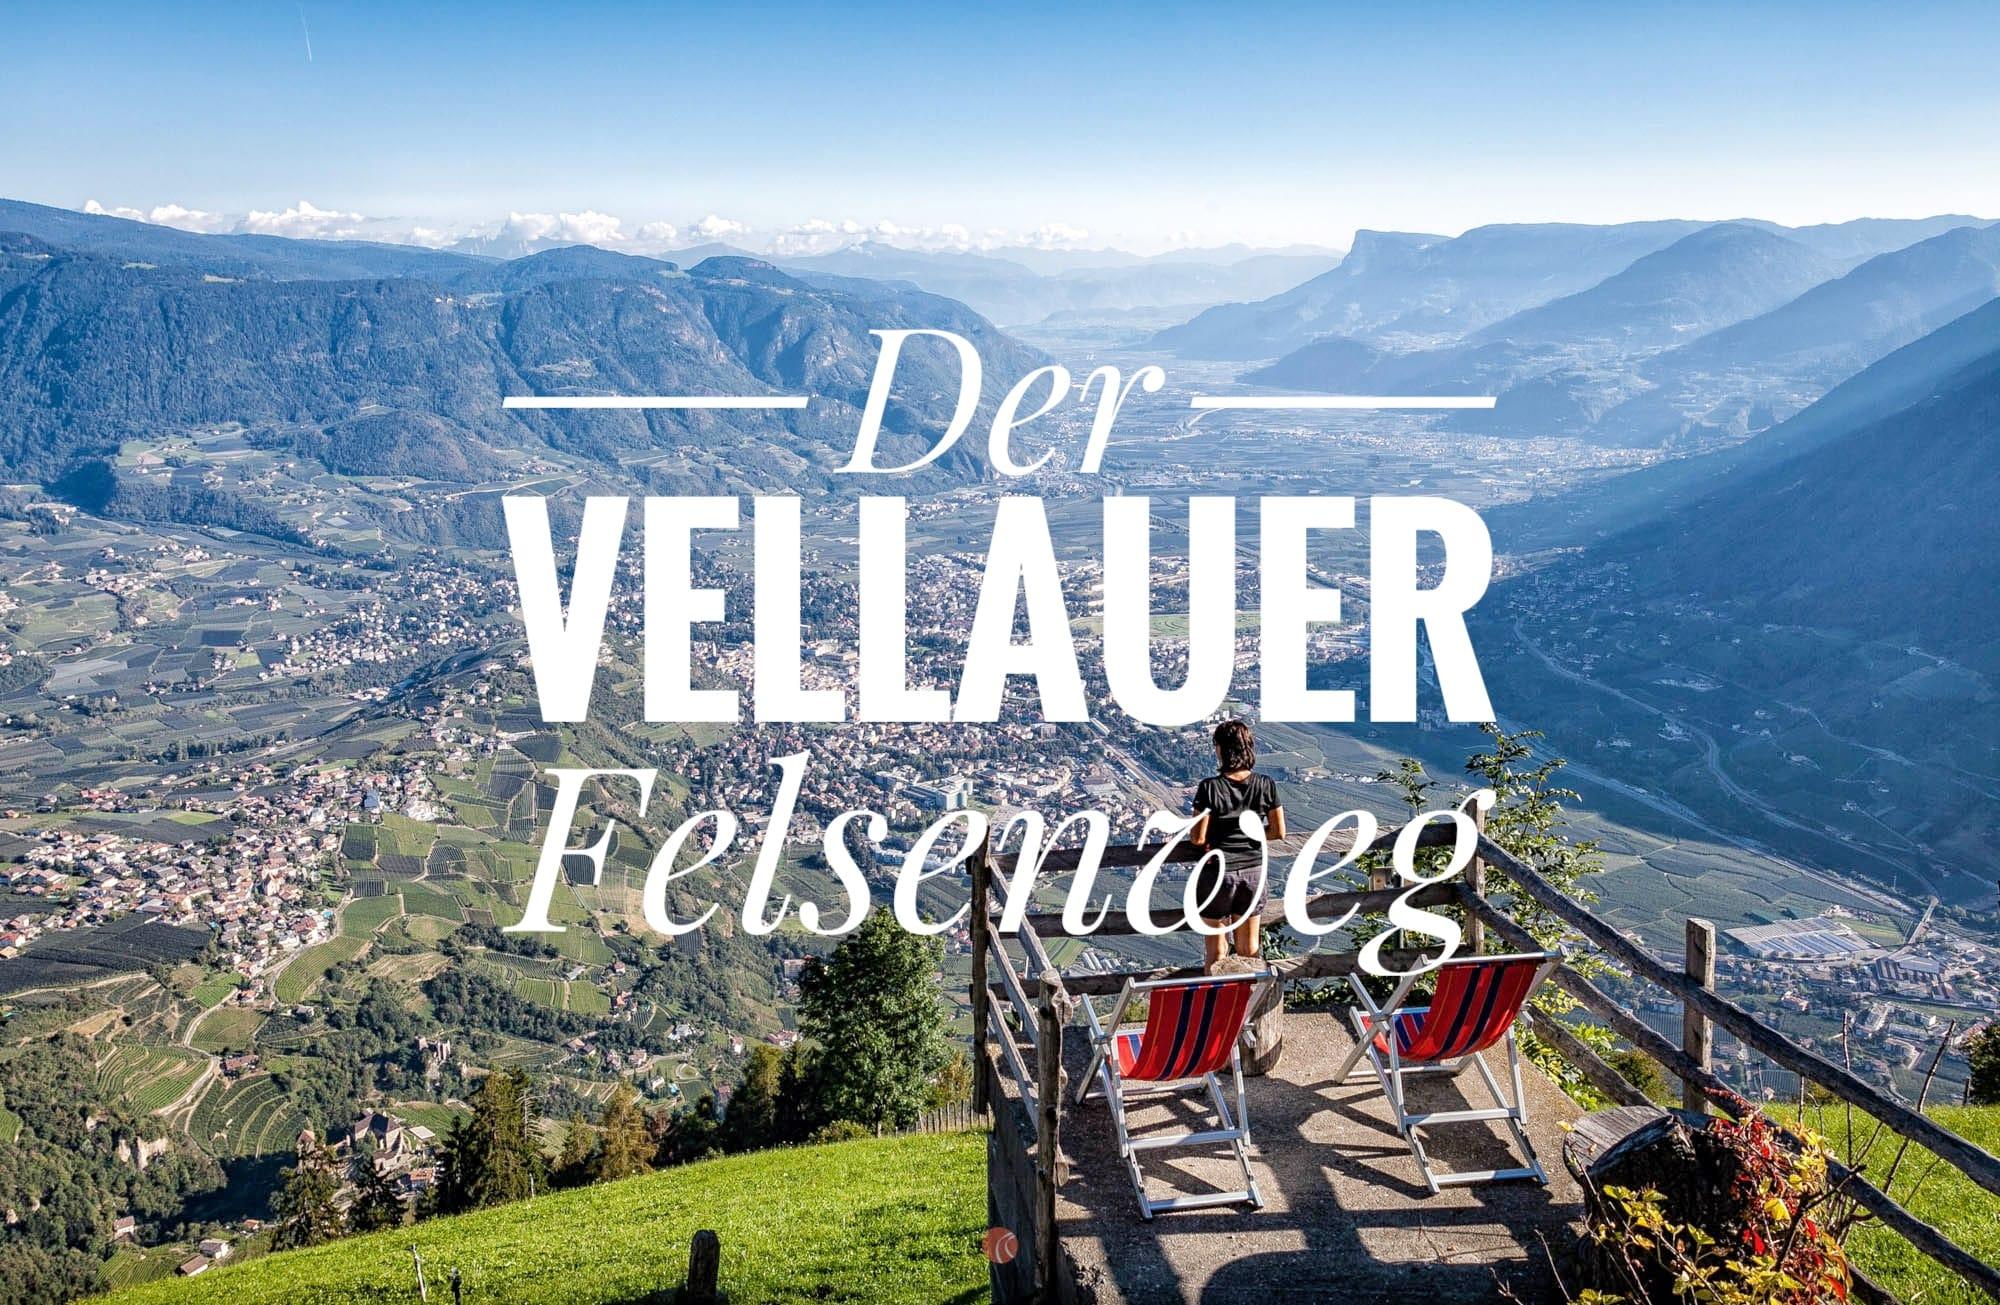 Vellauer Felsenweg – Wanderung Meran und Umgebung